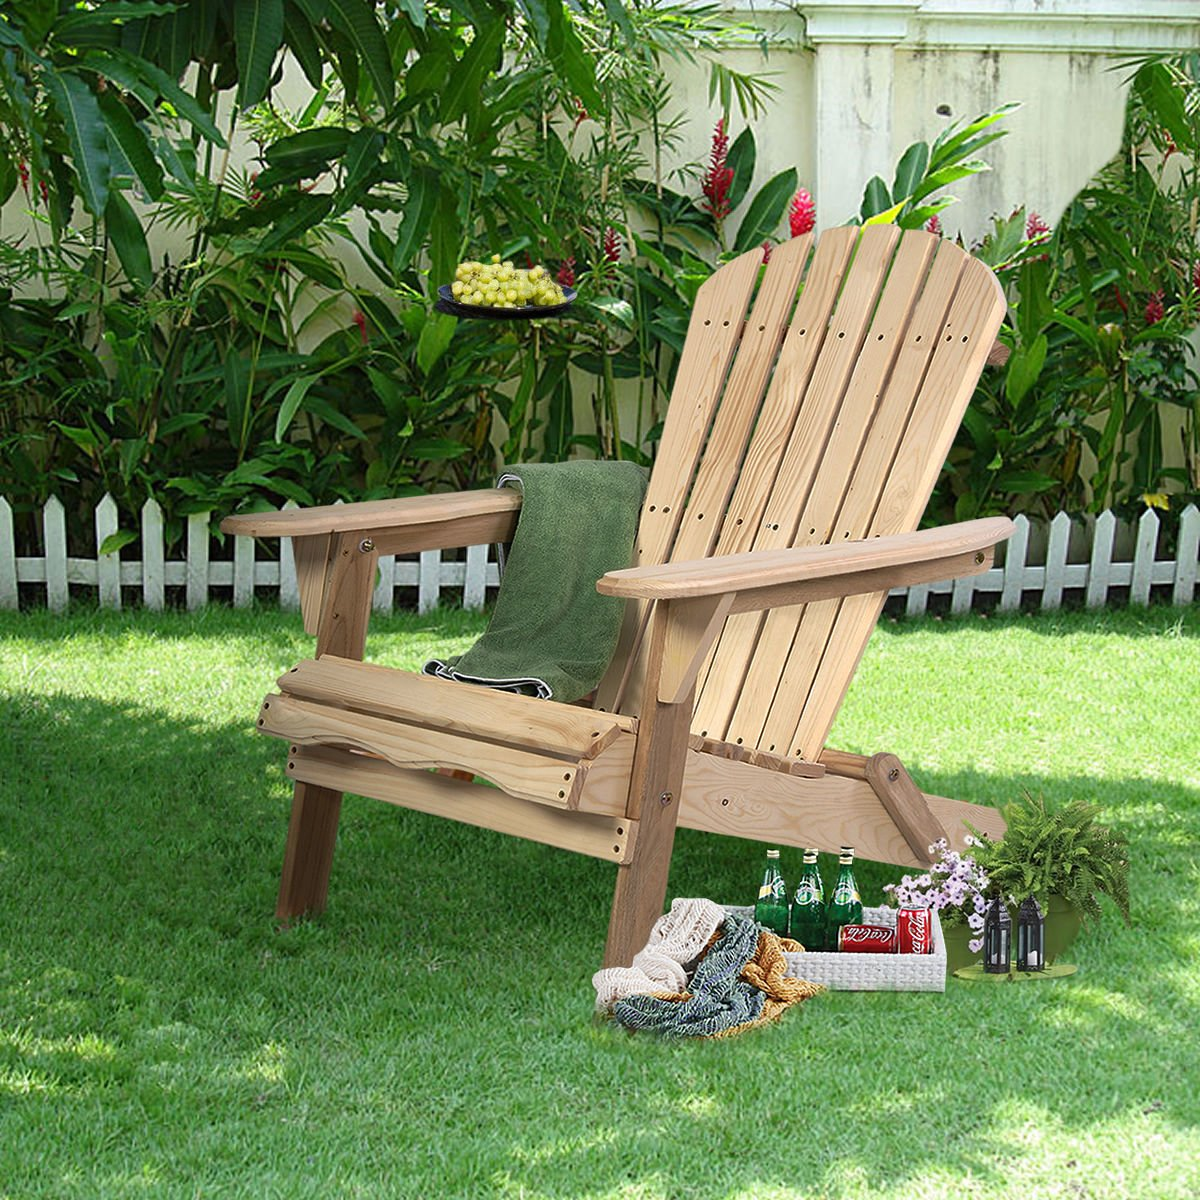 CY New Outdoor Foldable Fir Wood Adirondack Chair Patio Deck Garden Furniture